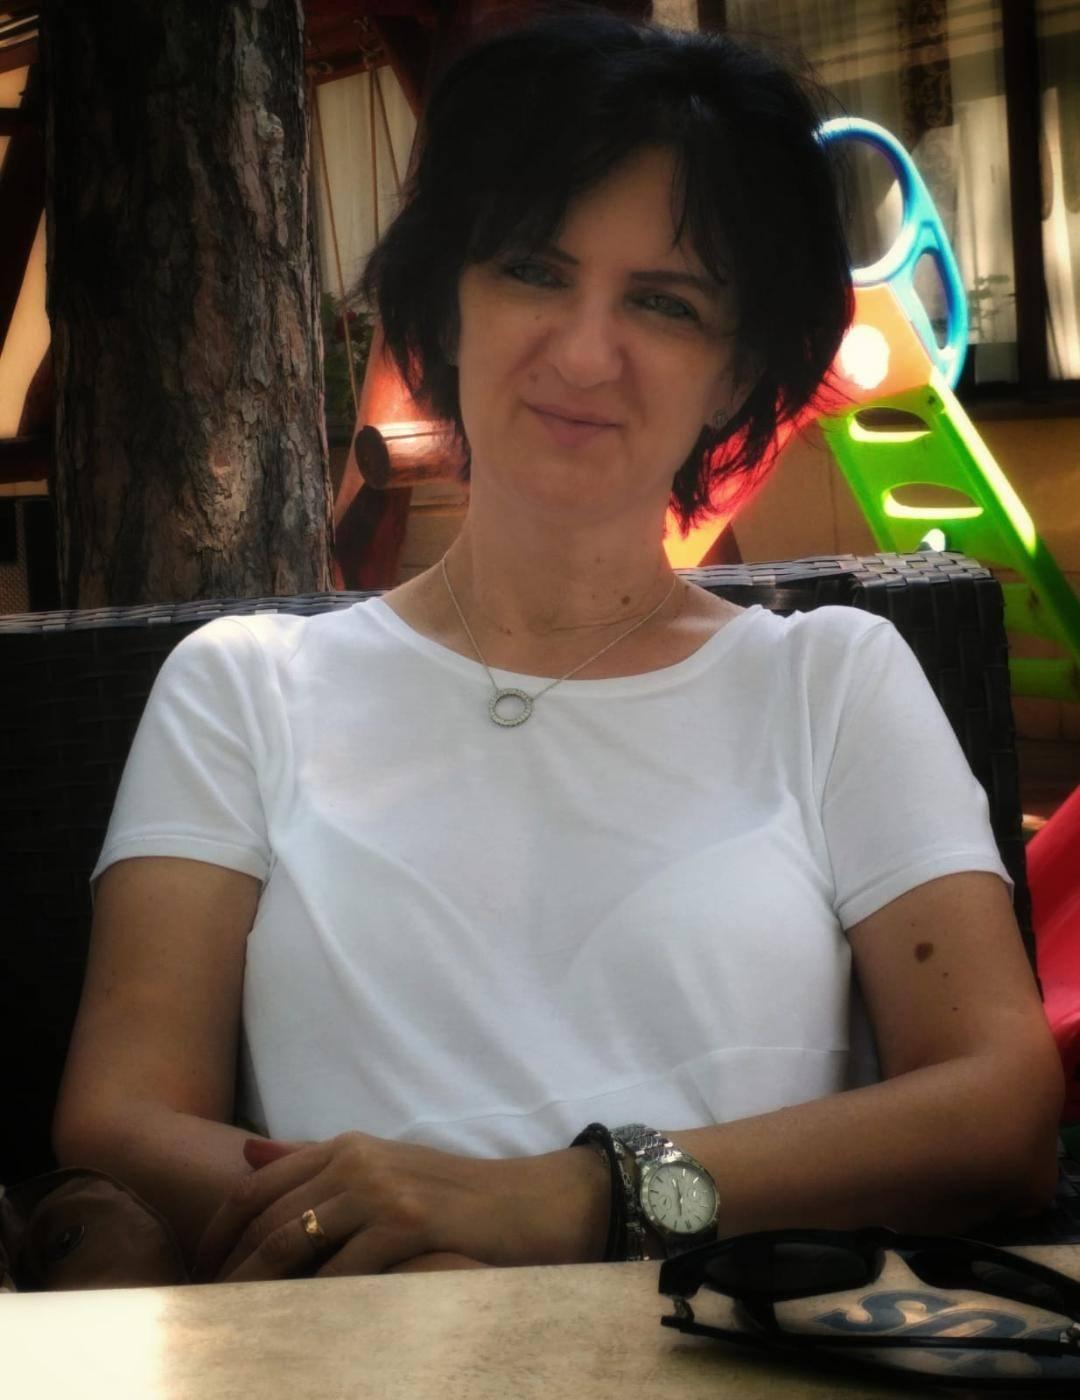 Anunturi Matrimoniale Femei Cauta Barbati Buziaș - Femei sex Buzias Timis - Intalniri Buzias